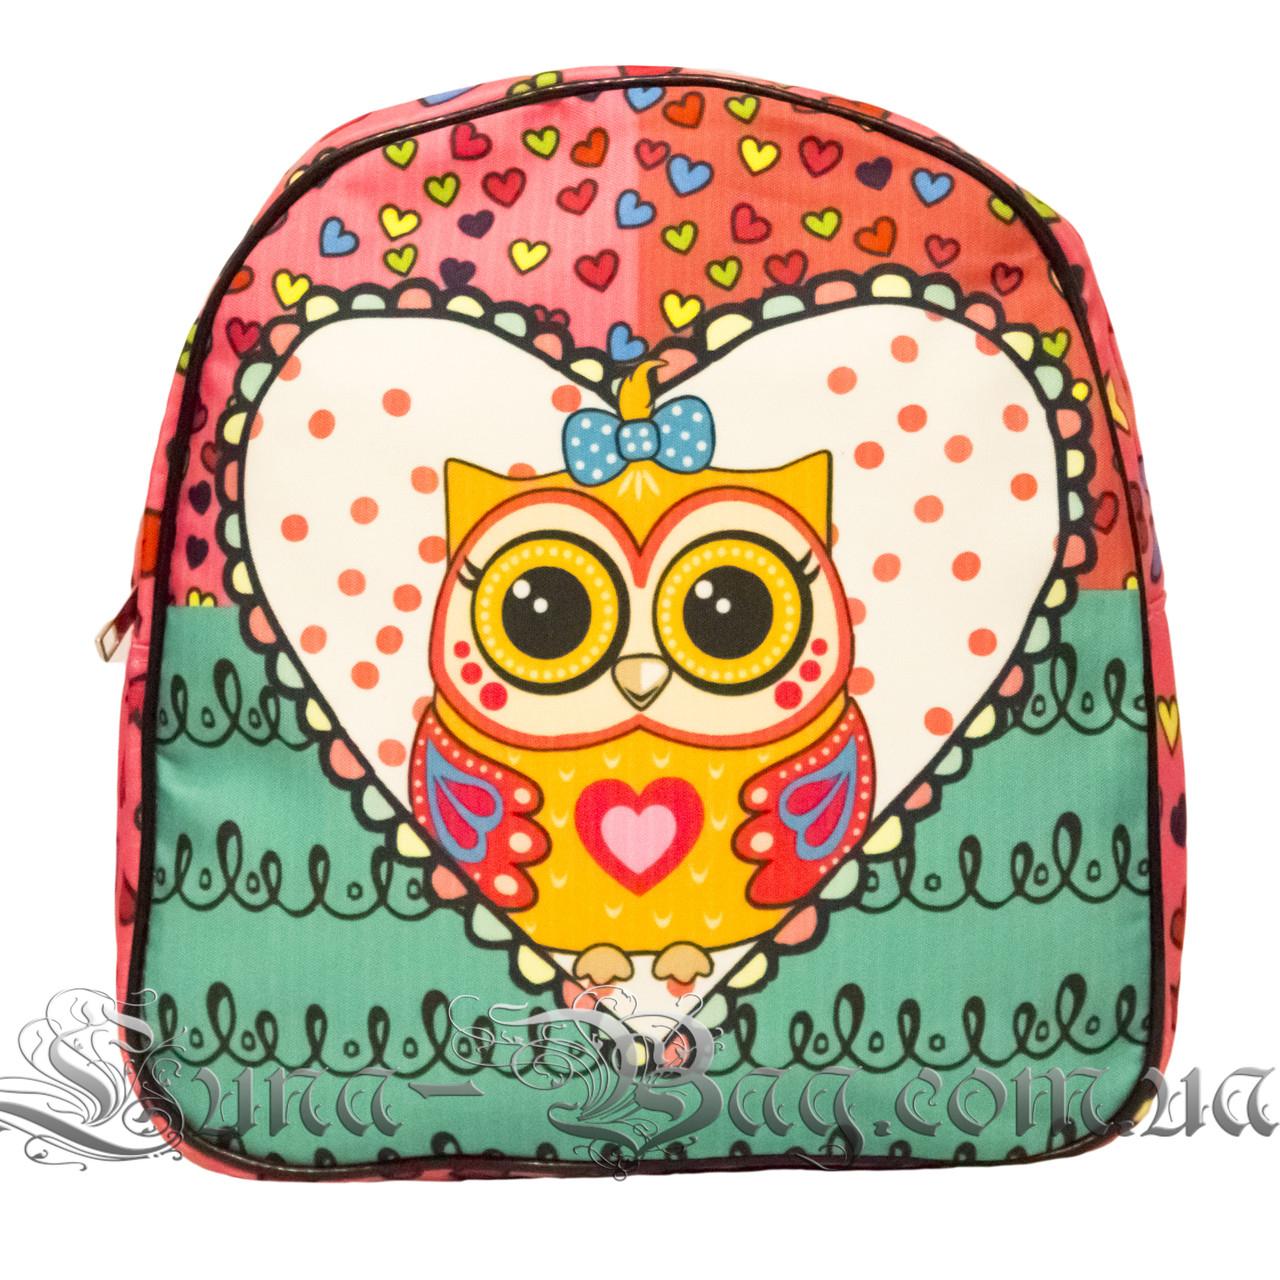 Яркий летний рюкзак Bright owls 4 Цвета . Розовый